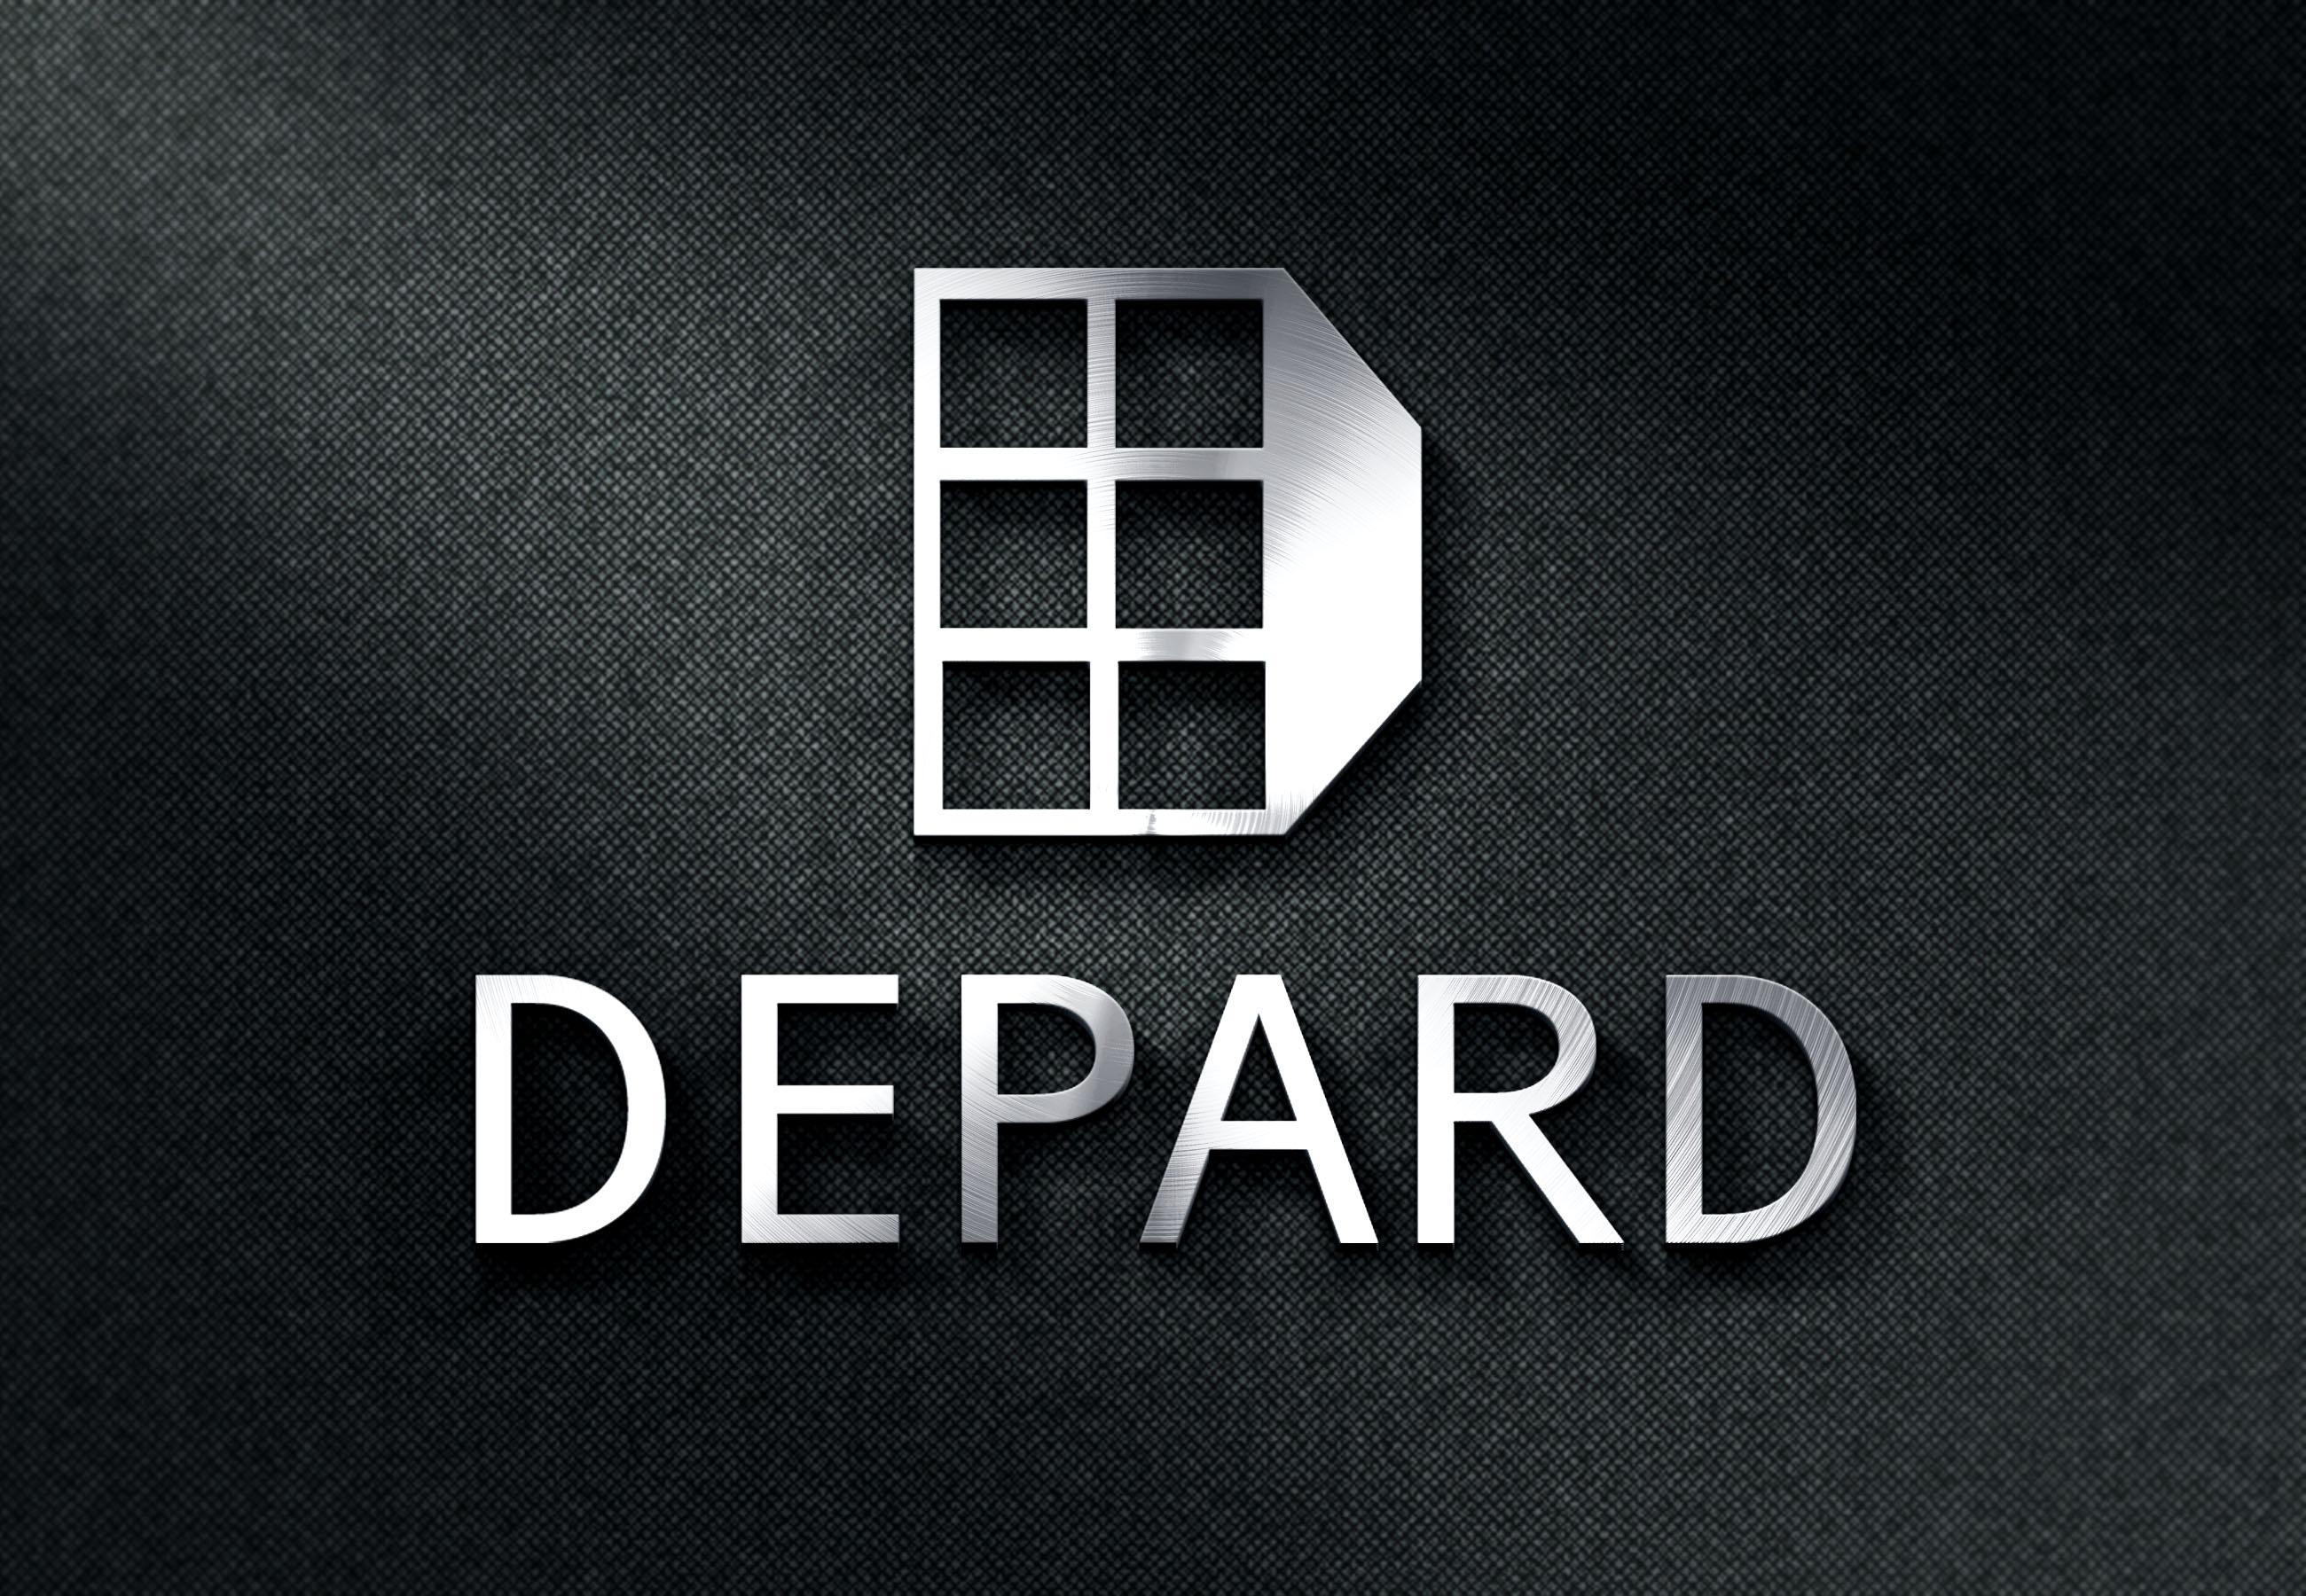 Логотип для компании (услуги недвижимость) фото f_576593098594689d.jpg